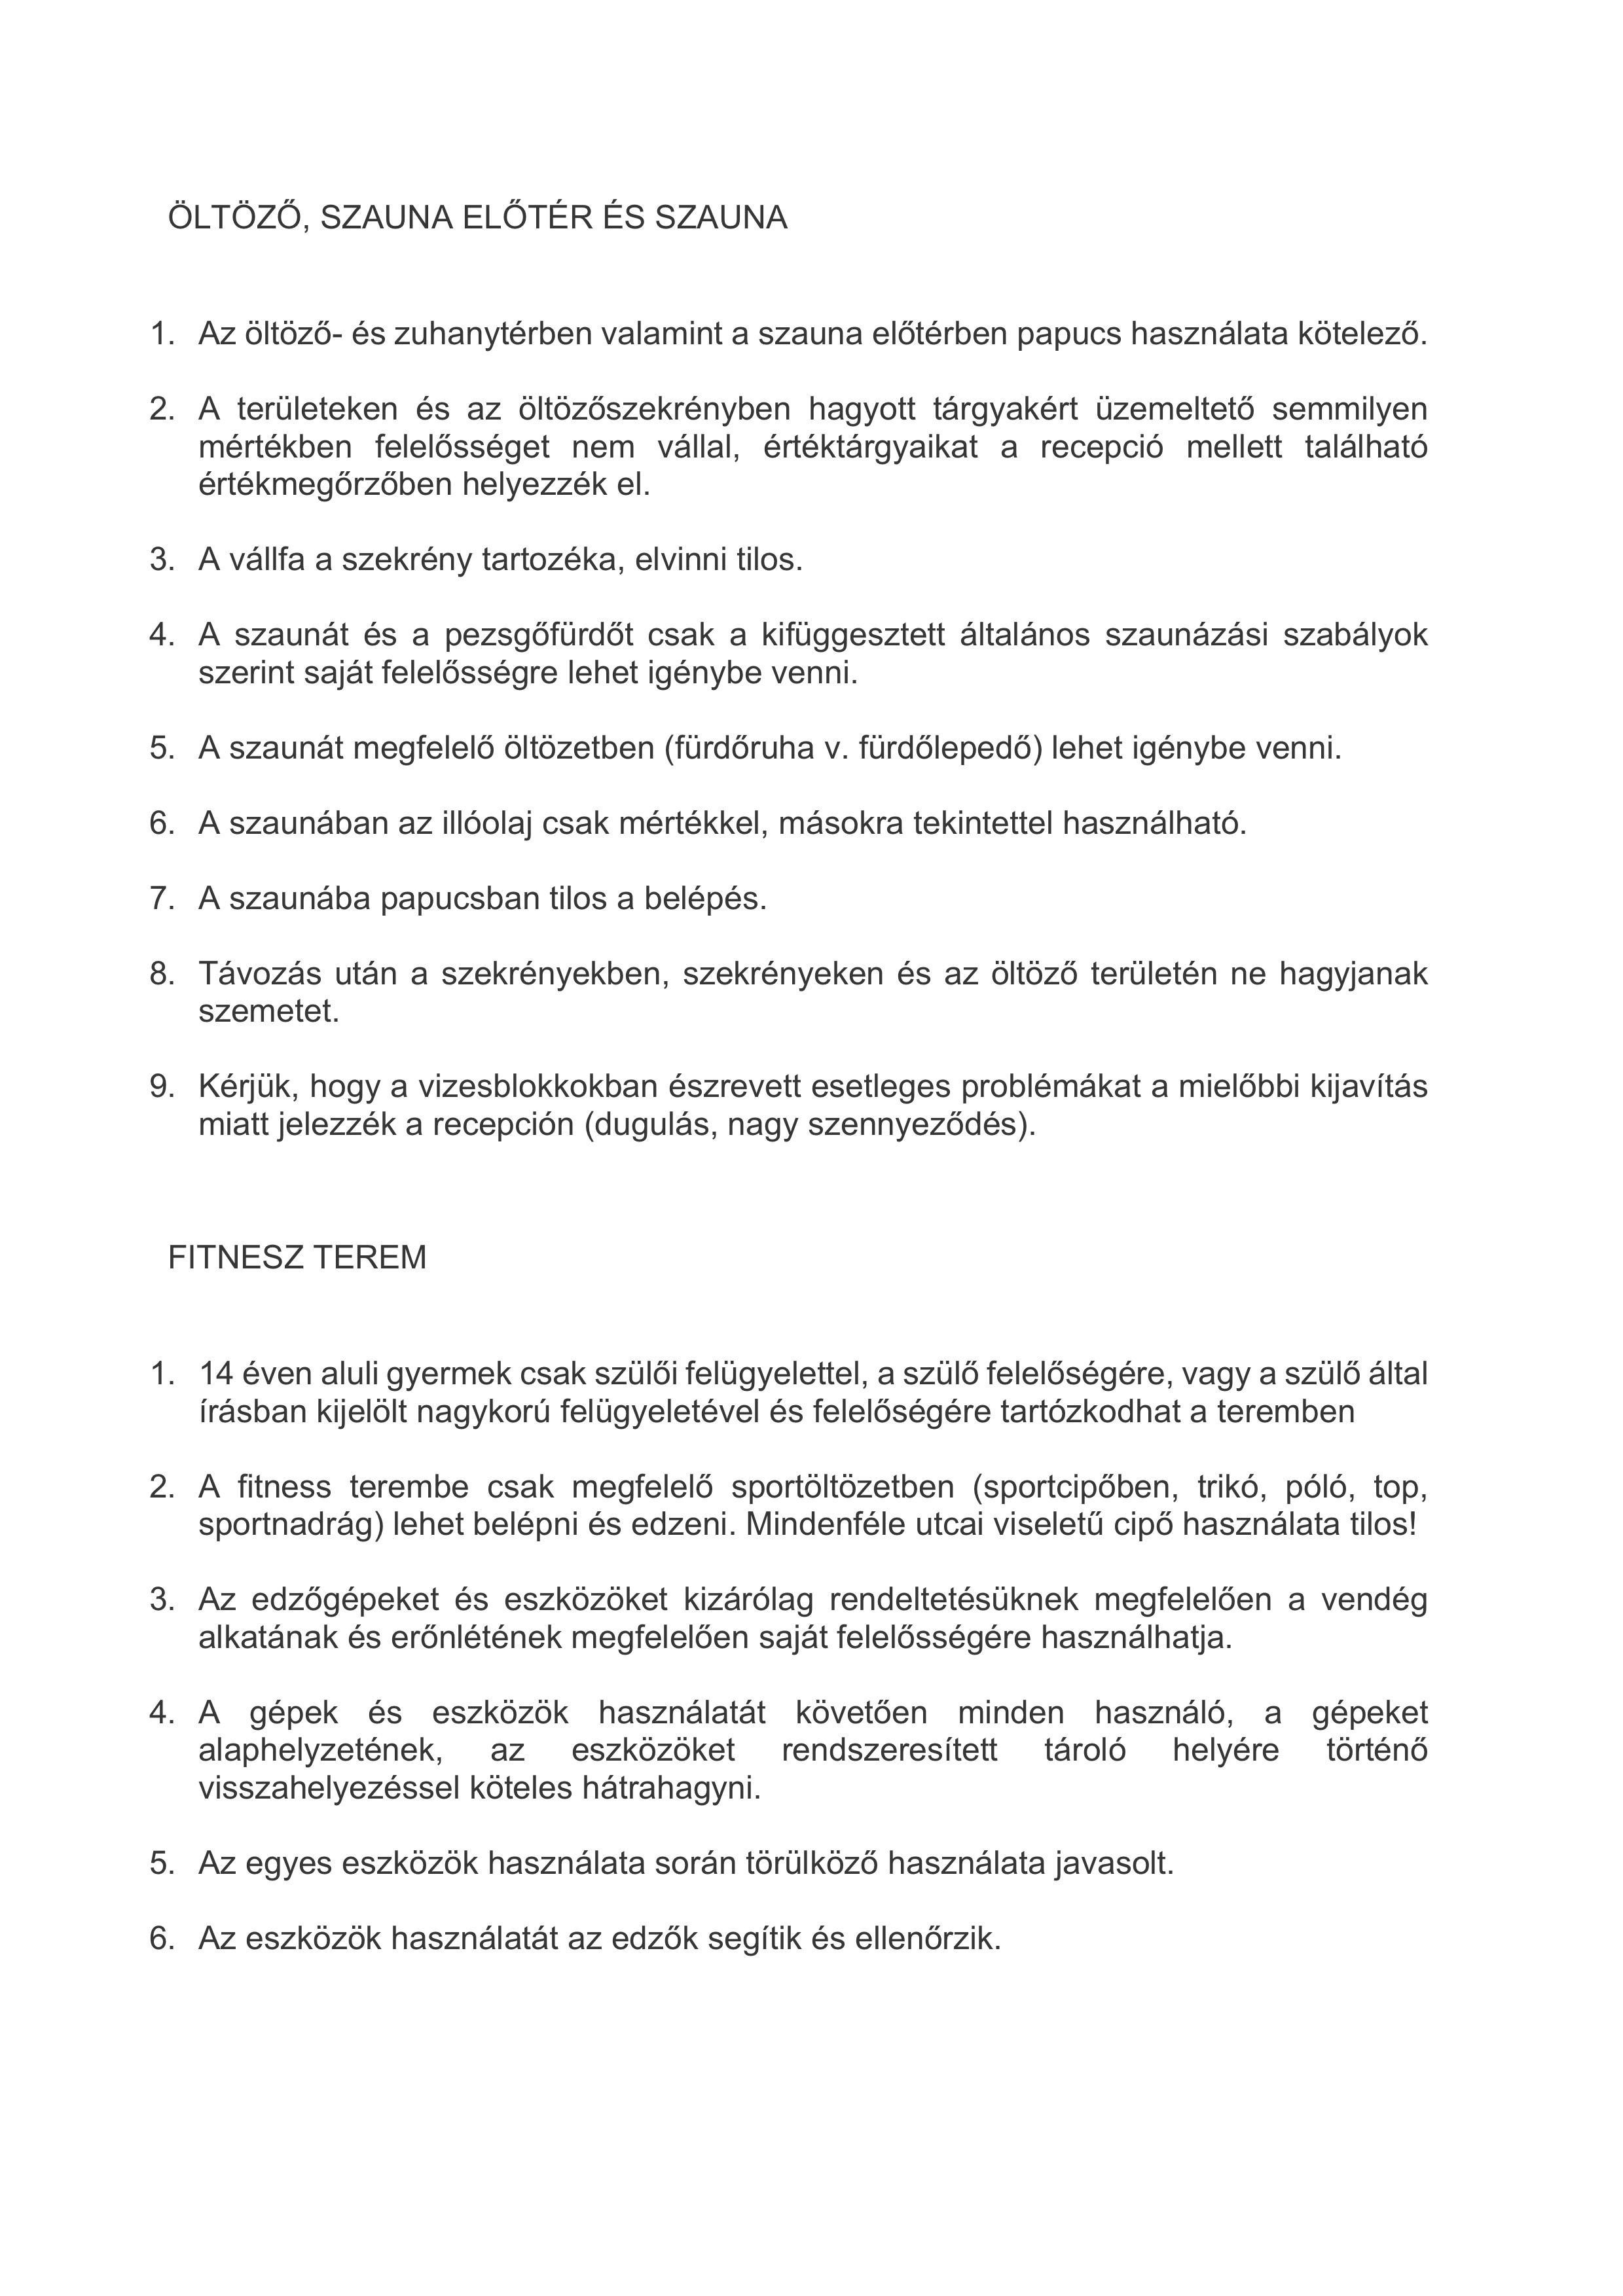 altalanos_szabalyok4